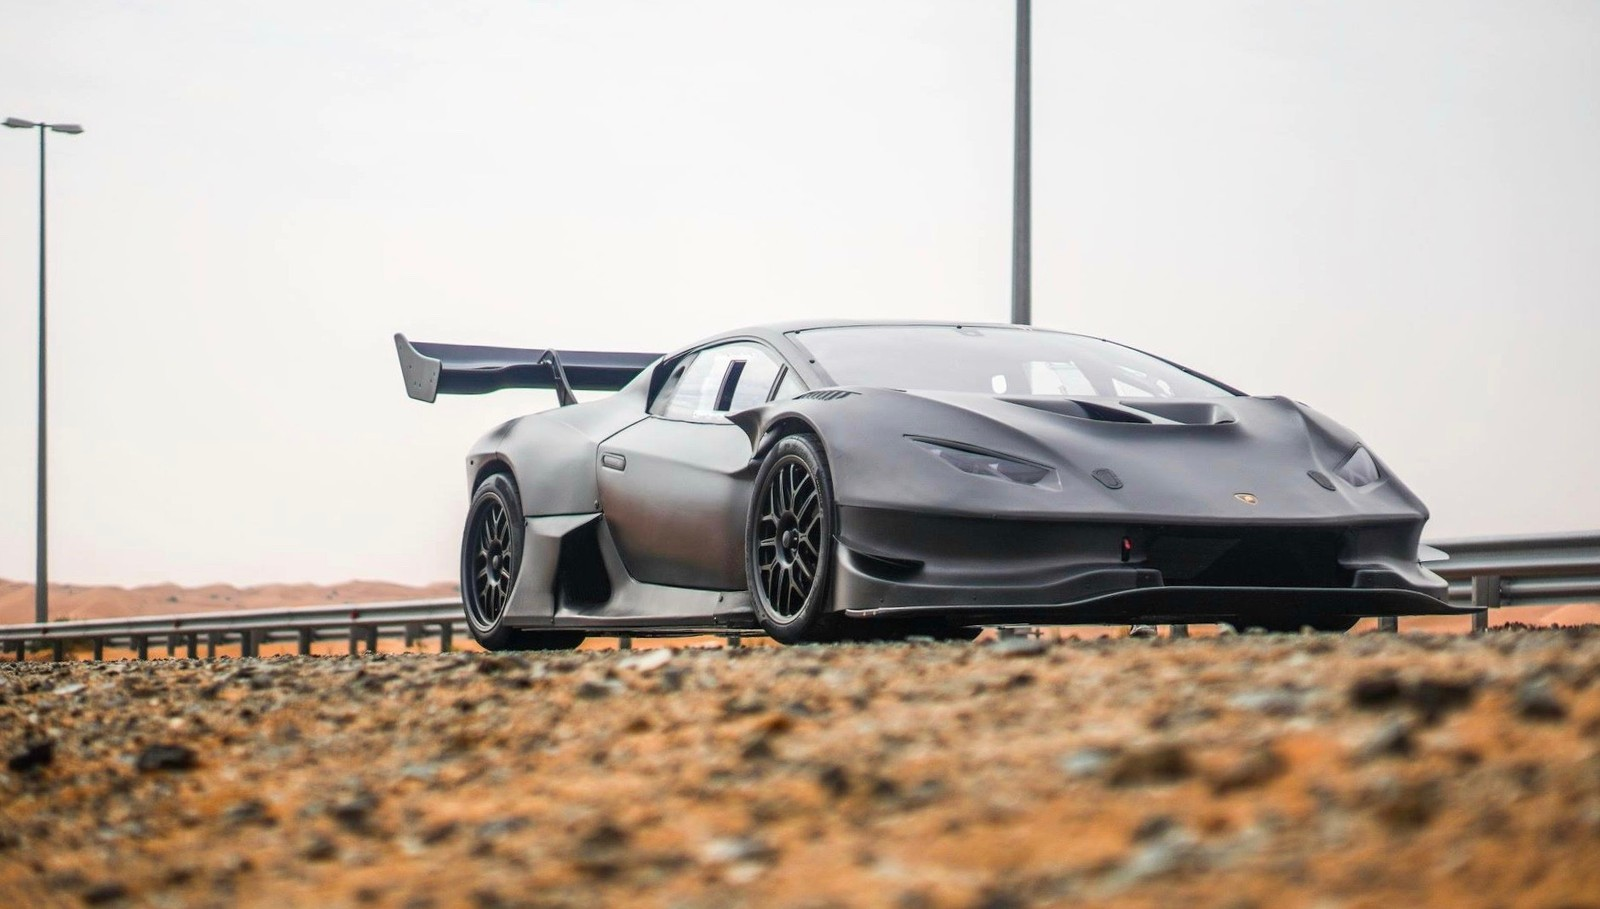 Zyrus-Engineering-Lamborghini-Huracan-LP1200-for-sale-1